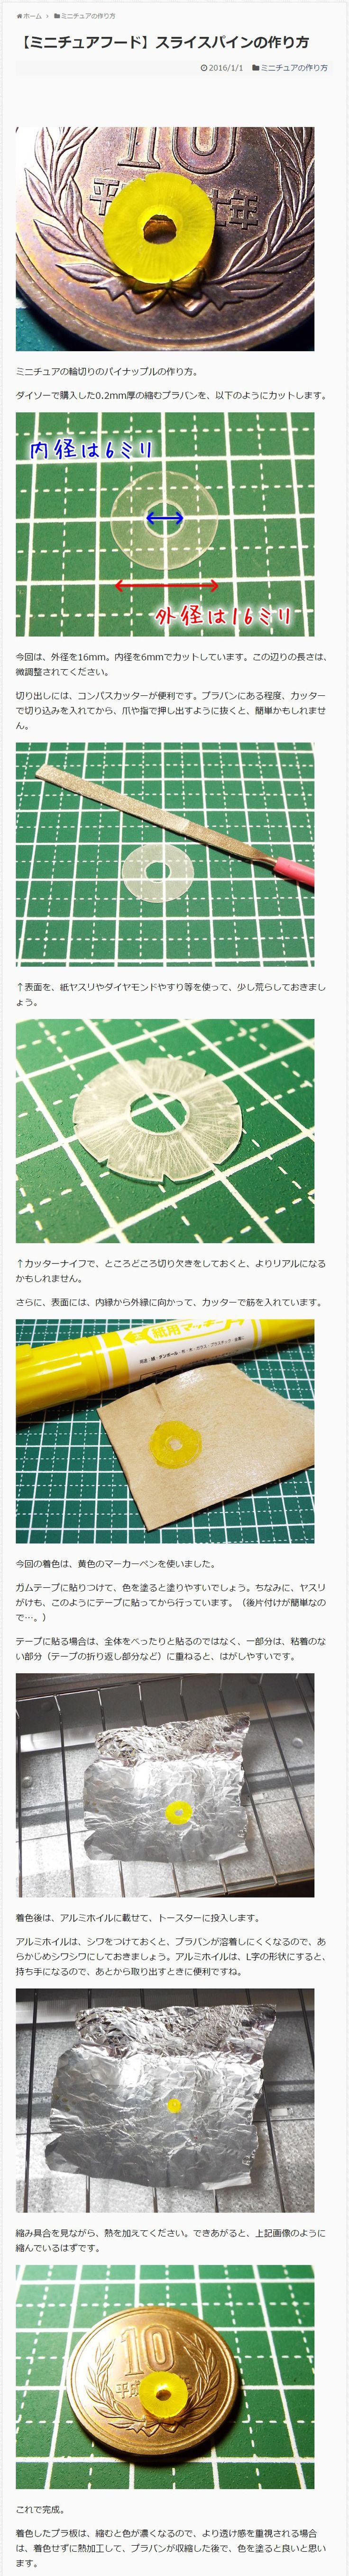 Making a Slice of Pineapple with Opakeplastic / Polyolefin Shrink Film (POF) | ミニチュアフード】スライスパインの作り方 | 以收縮膠/熱縮膠製作波蘿片